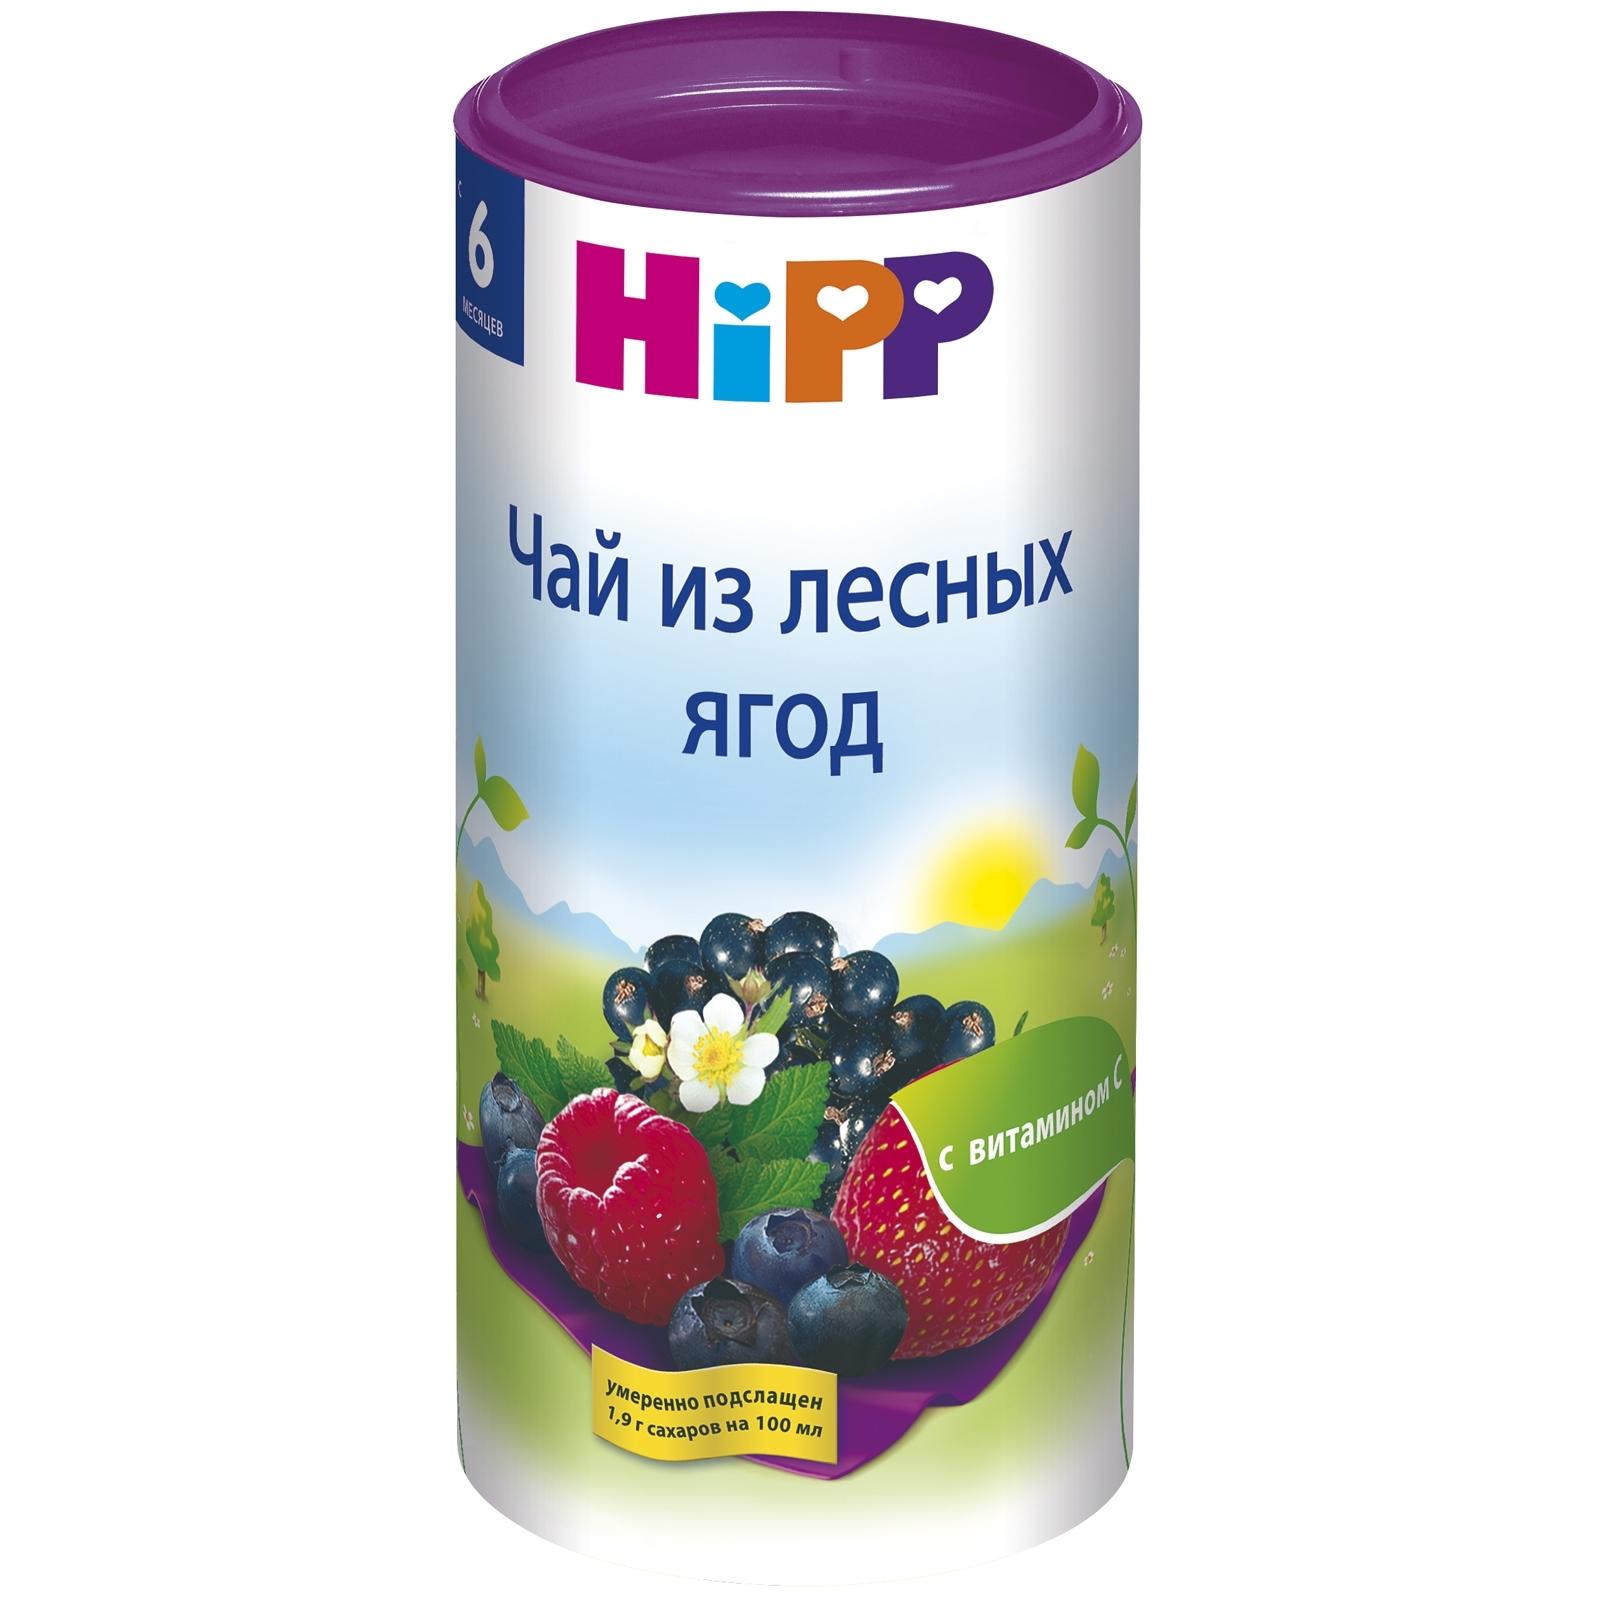 ��� ������� Hipp ����������������� 200 �� ������ ����� (� 6 ���)